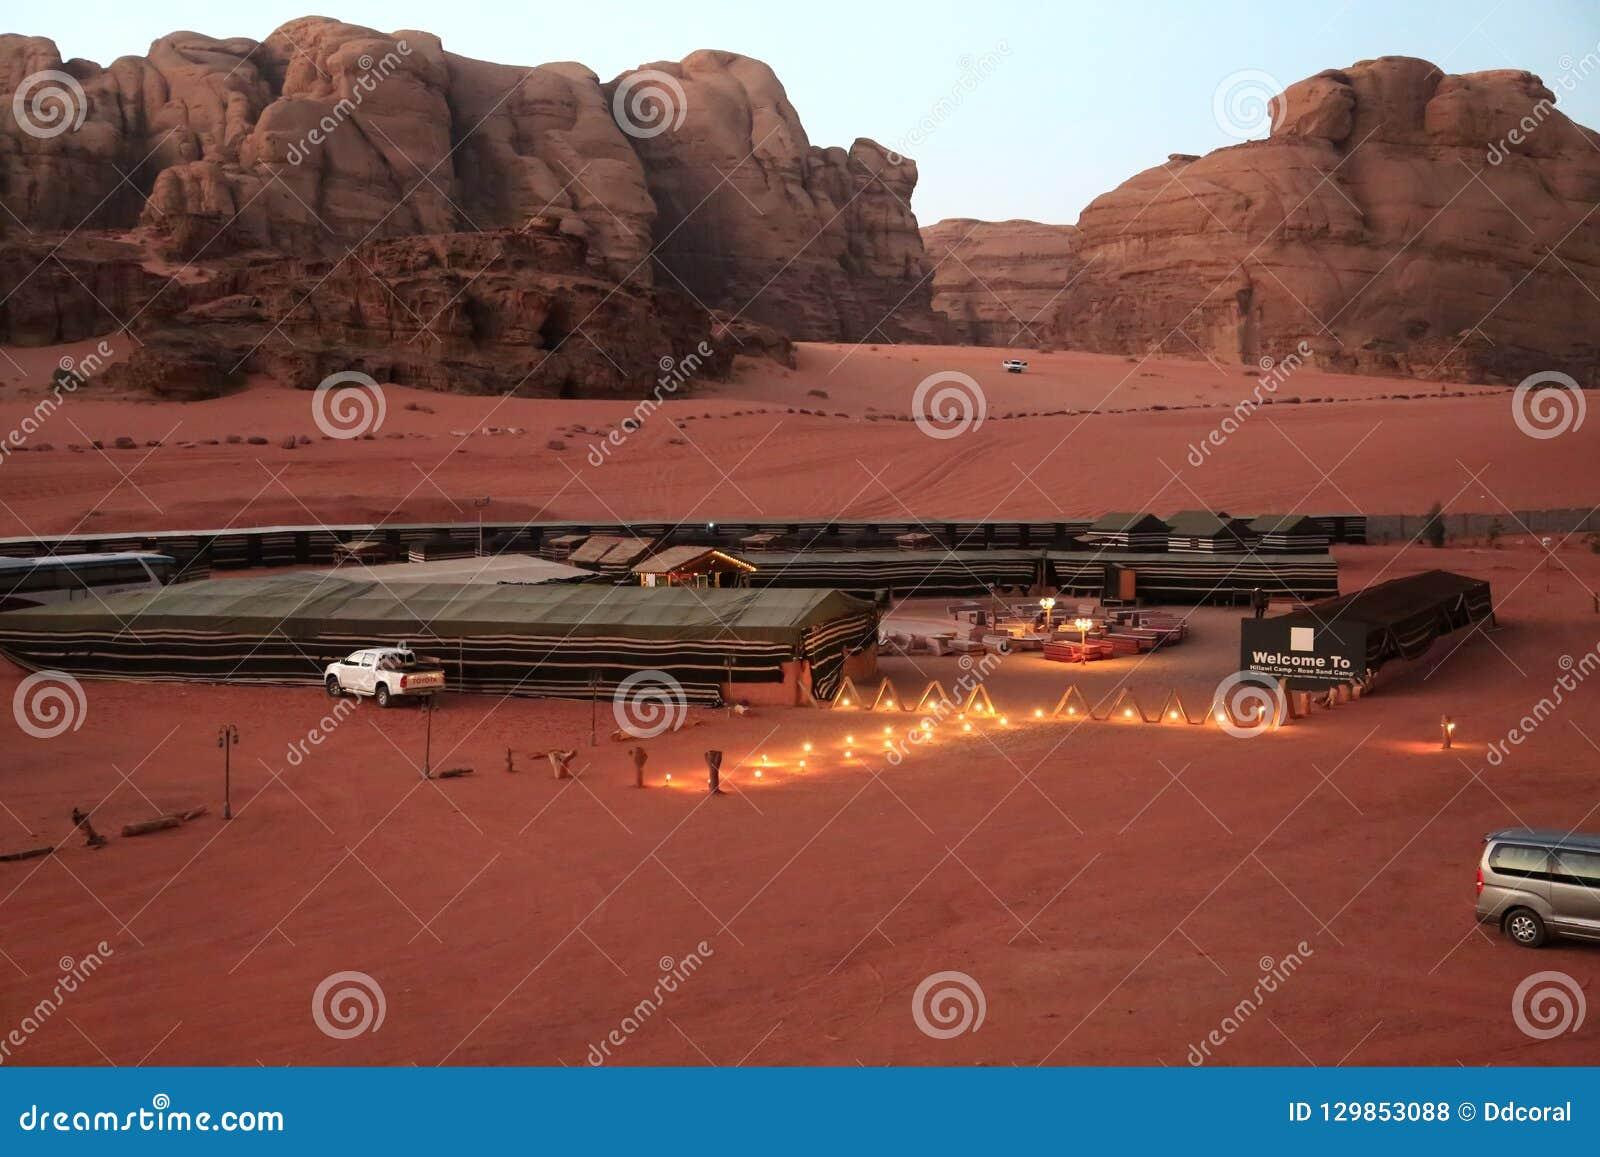 Hillawikamp - nam zandkamp in Wadi Rum-woestijn, Jordanië toe